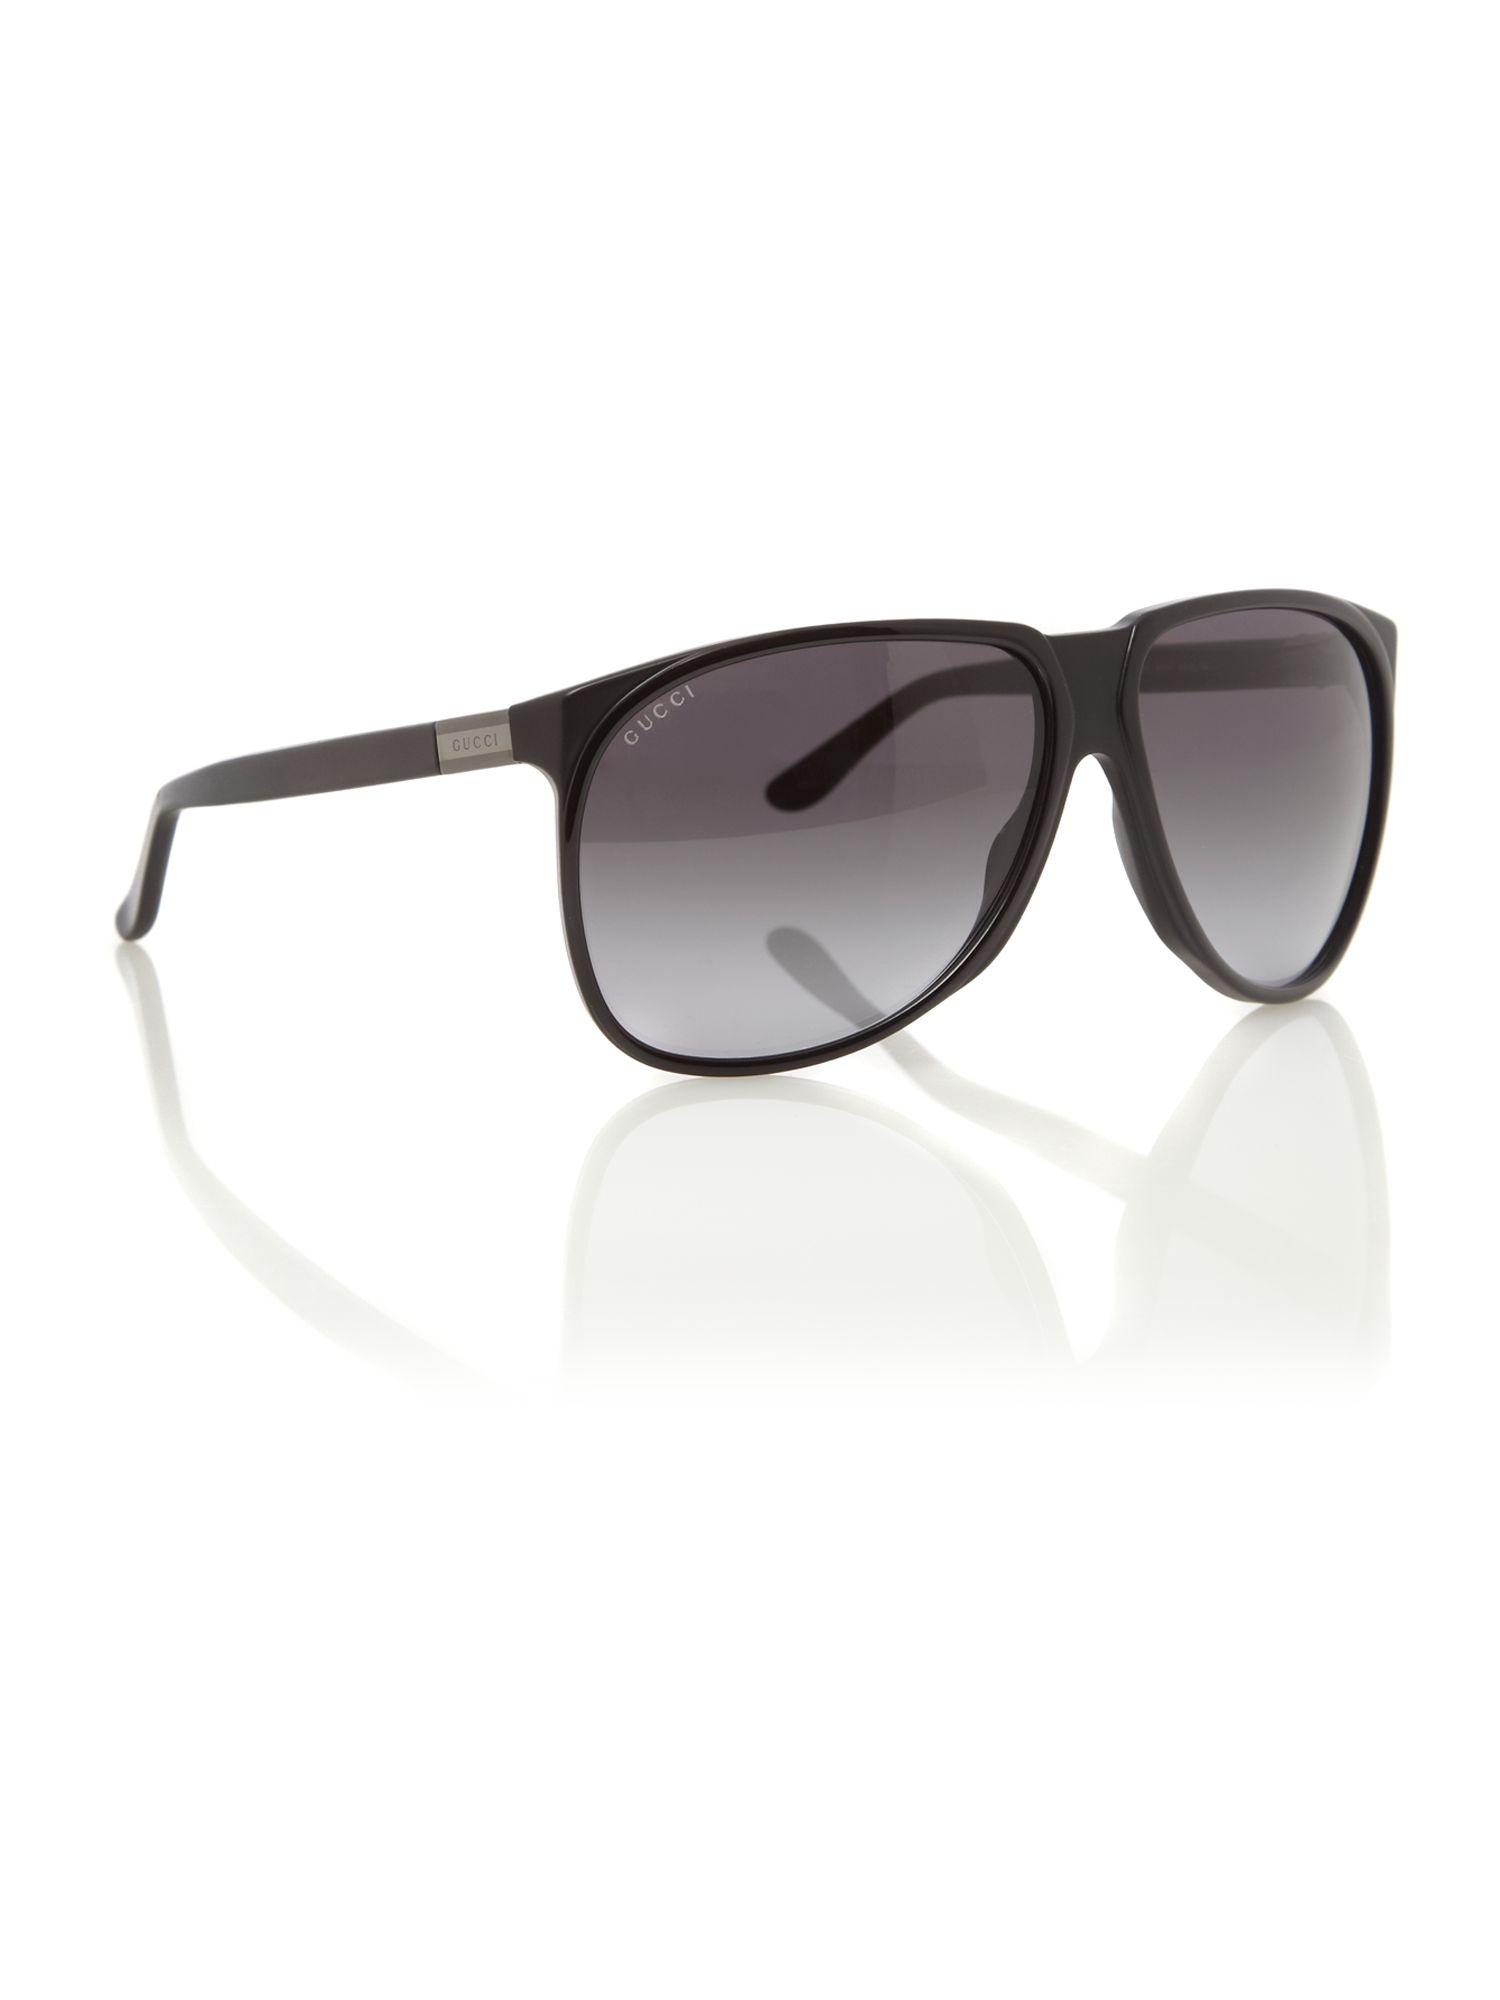 76cc52d9191 Gucci Mens Gucci 1627 s Aviator Sunglasses